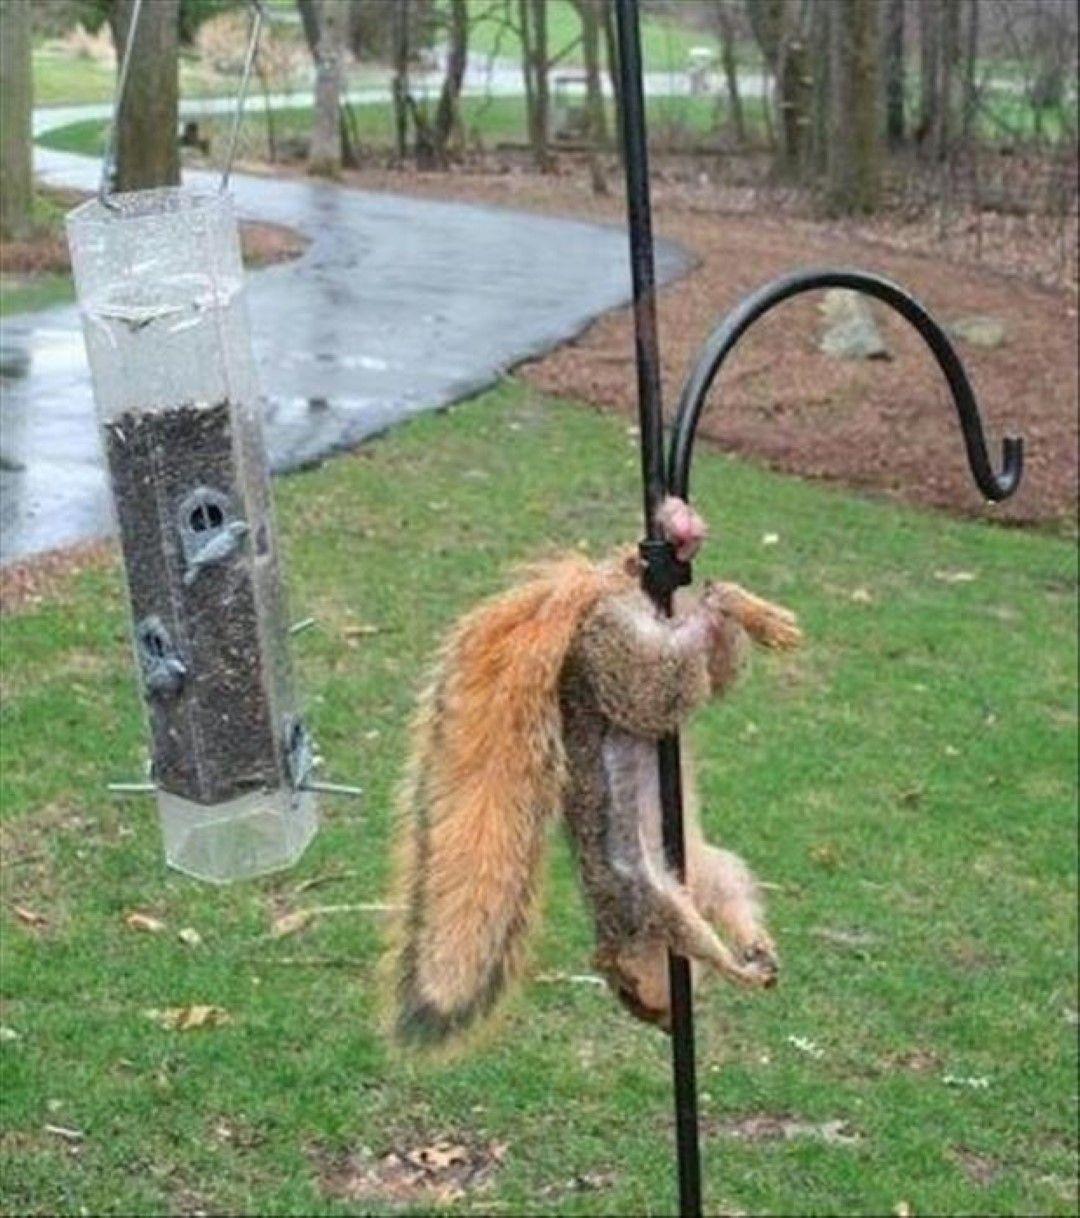 Funny Animal Fails (21 Pics) | Peachya